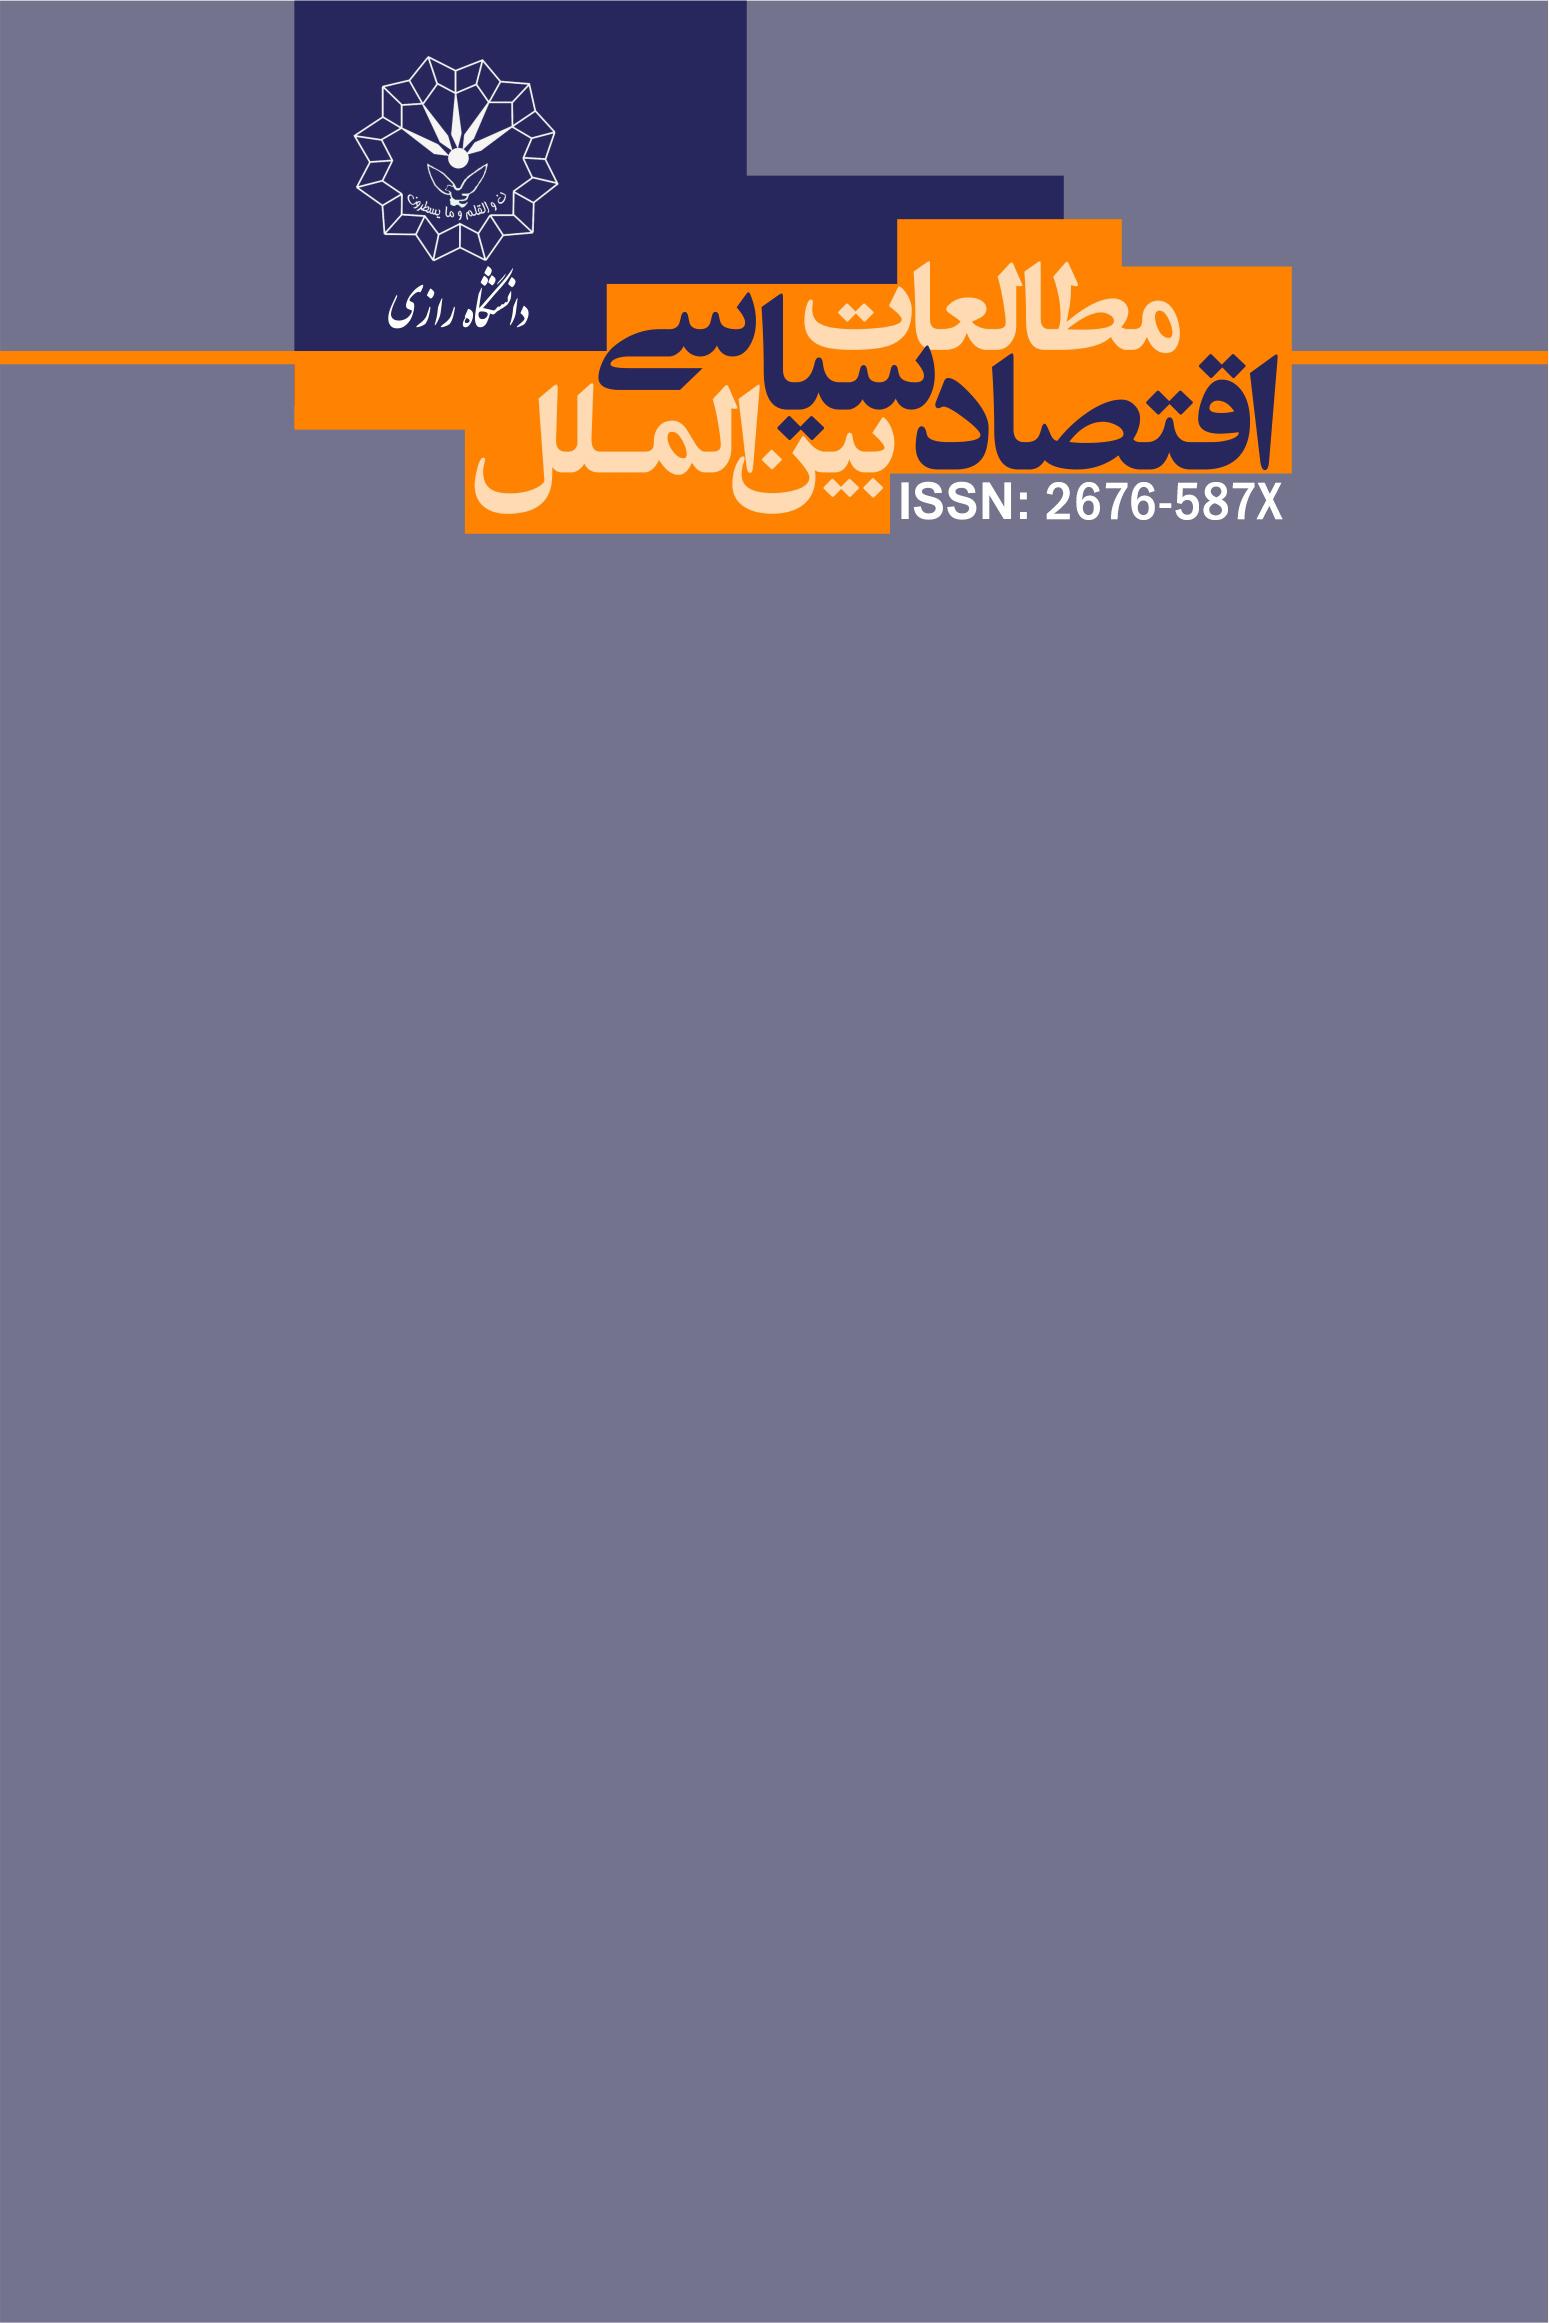 مطالعات اقتصاد سیاسی بین الملل